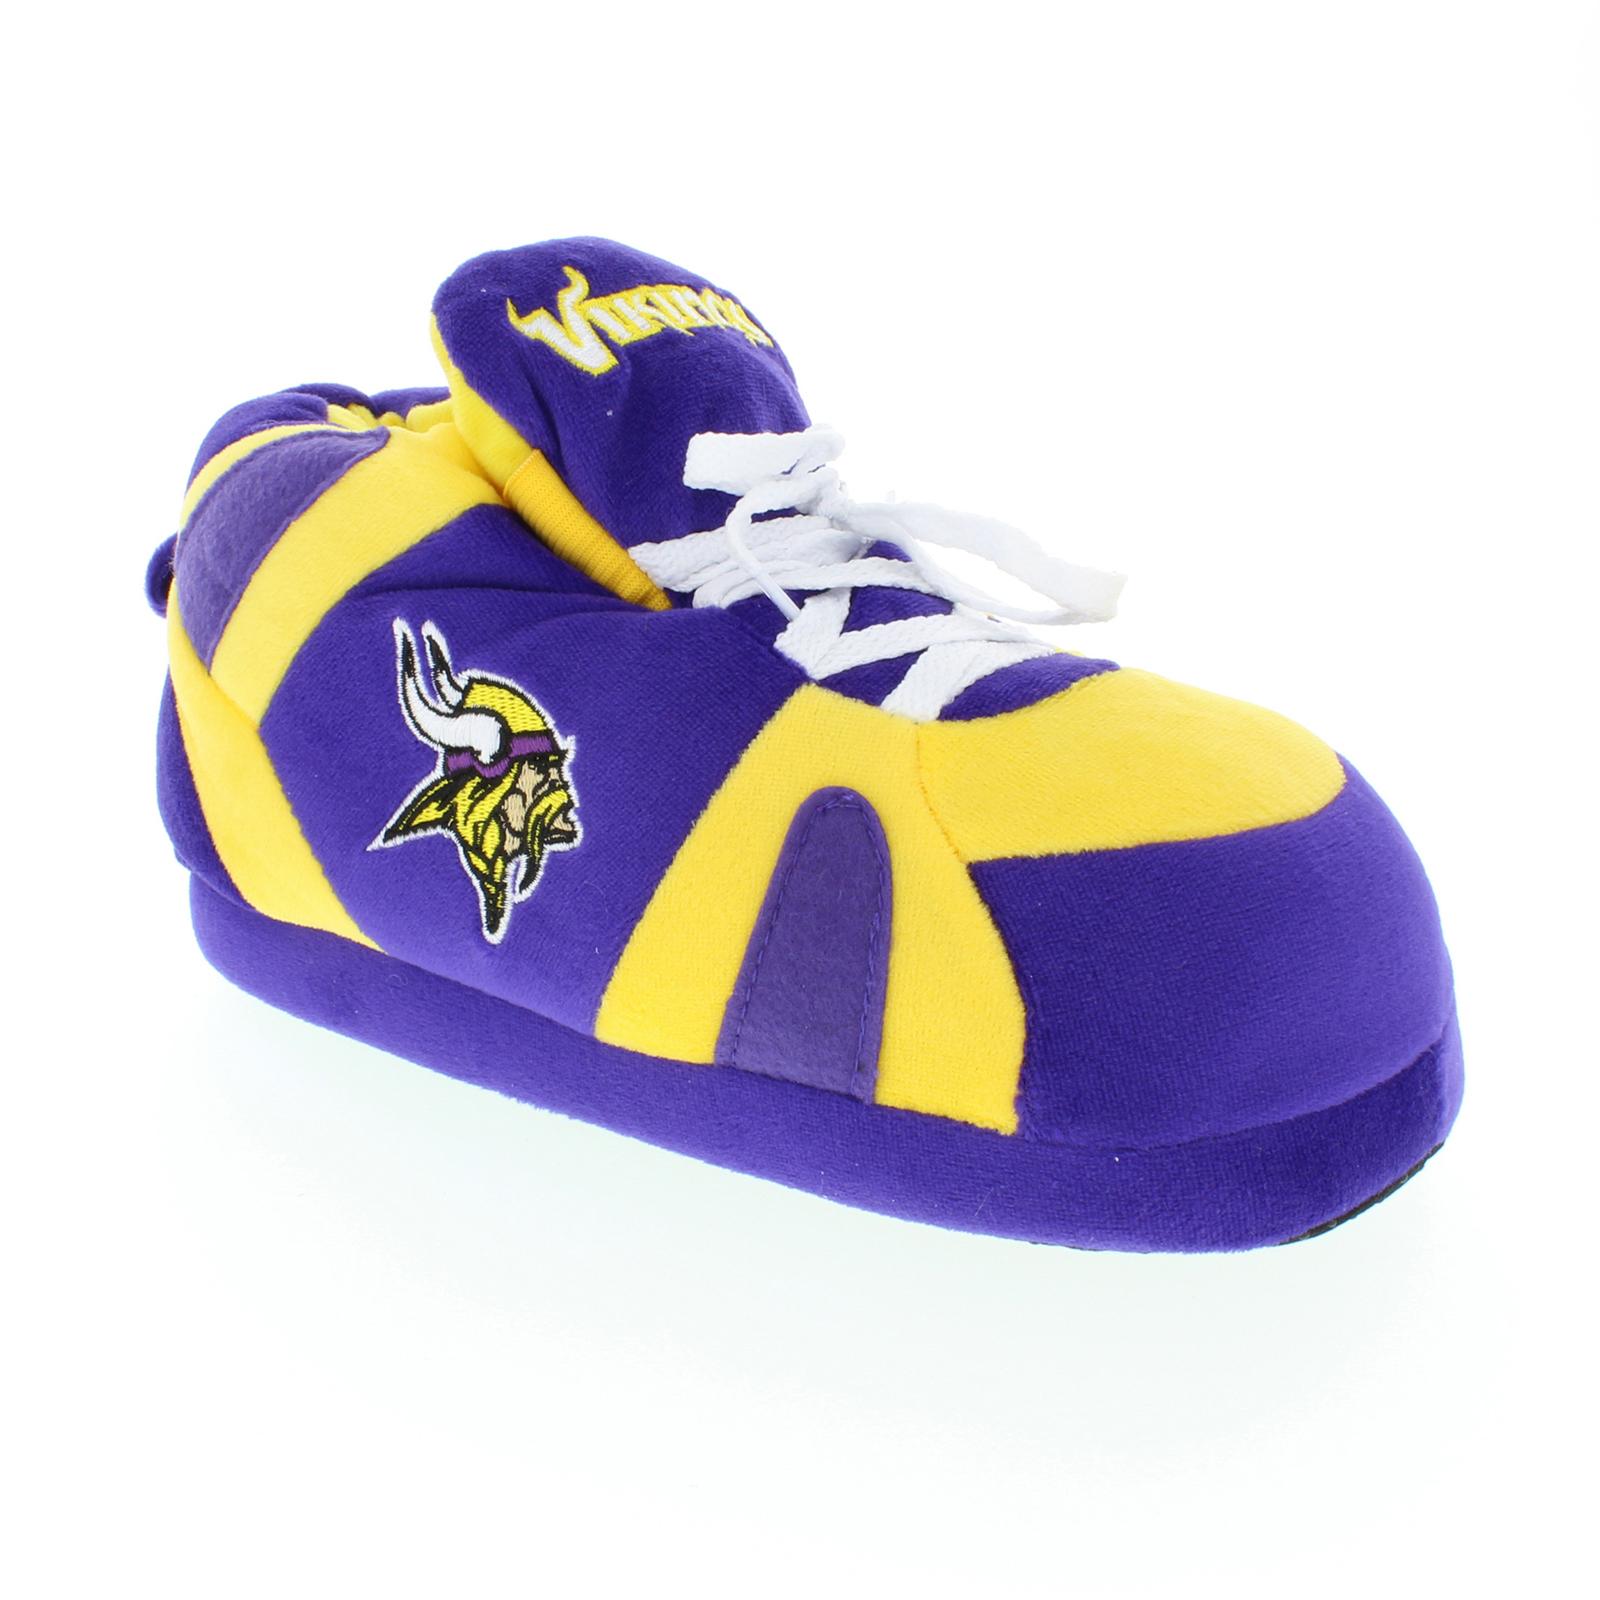 Comfy Feet NFL Minnesota Vikings 2XL Slipper PartNumber: 080V003126712000P KsnValue: 3126712 MfgPartNumber: 184437